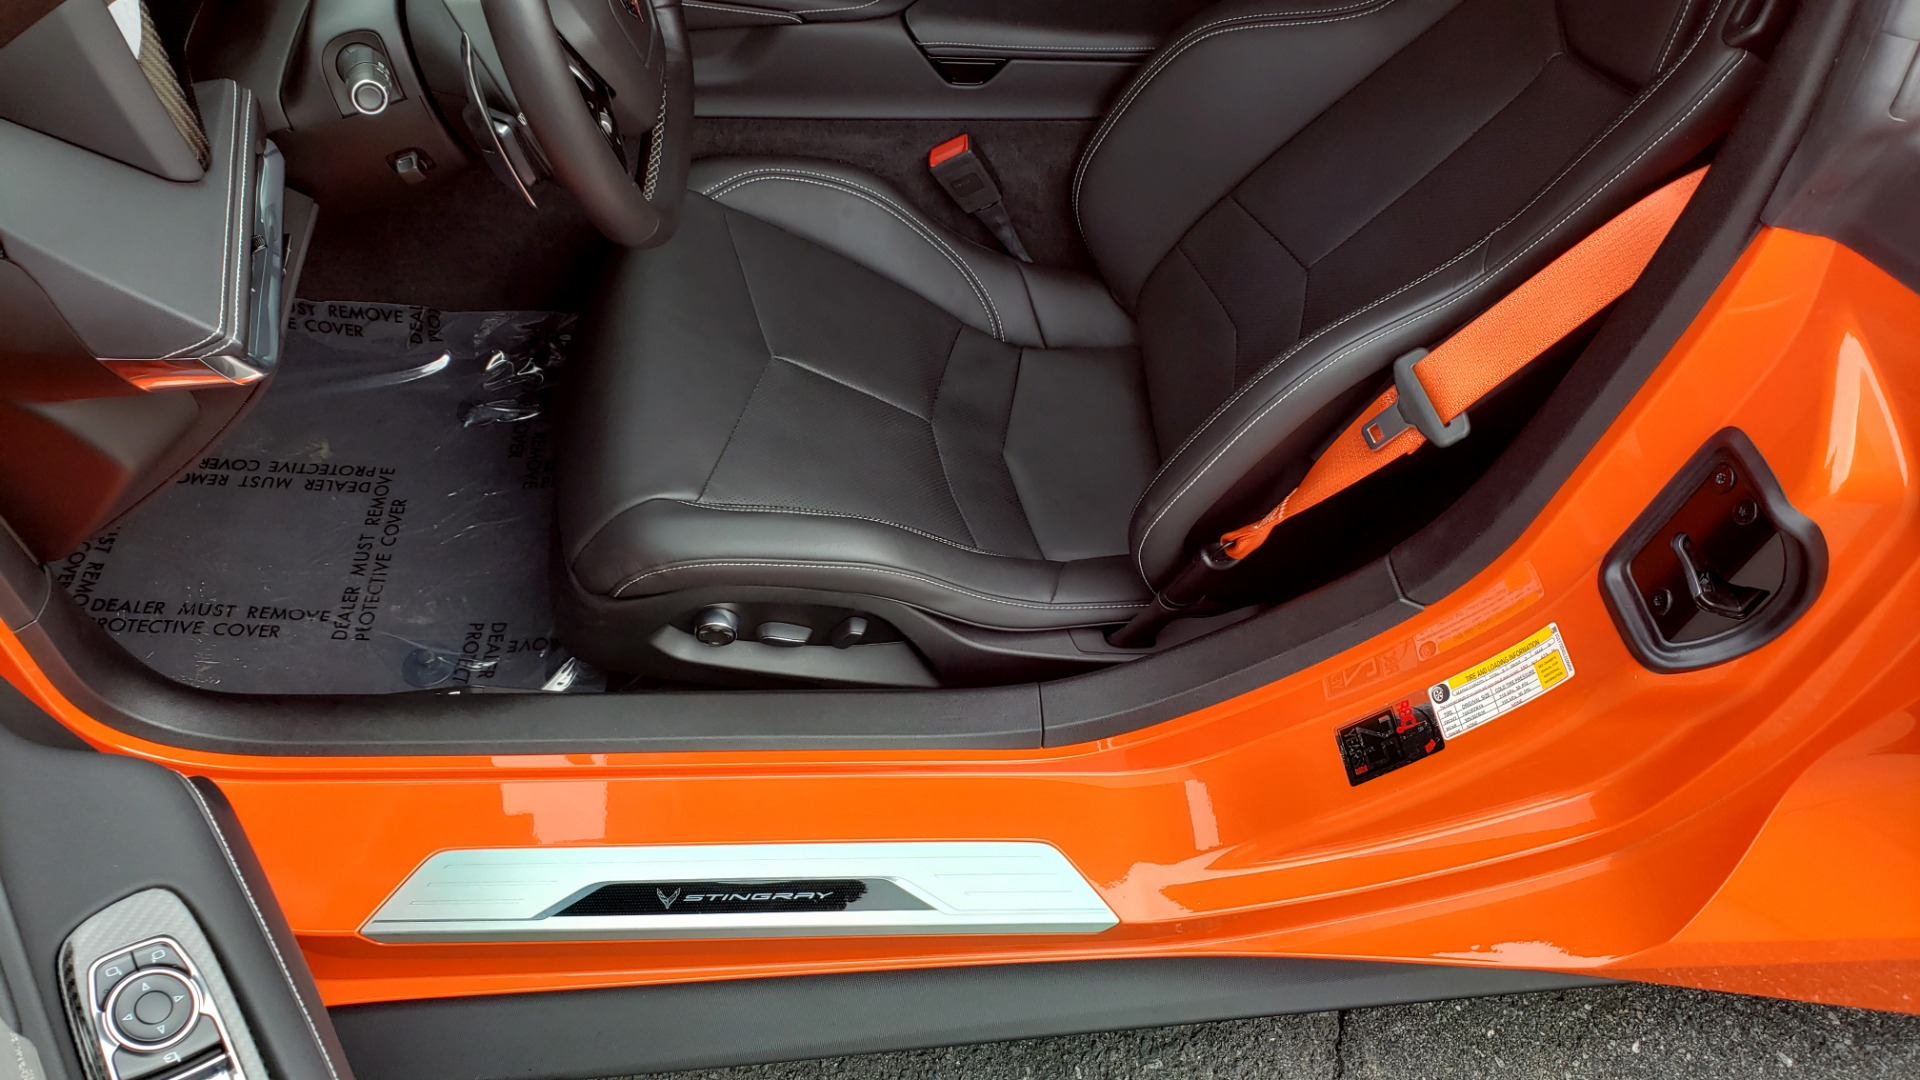 Used 2020 Chevrolet CORVETTE C8 STINGRAY 2LT / 6.2L V8 / 8-SPD AUTO / NAV / BOSE / REARVIEW / DATA RECOR for sale Sold at Formula Imports in Charlotte NC 28227 38